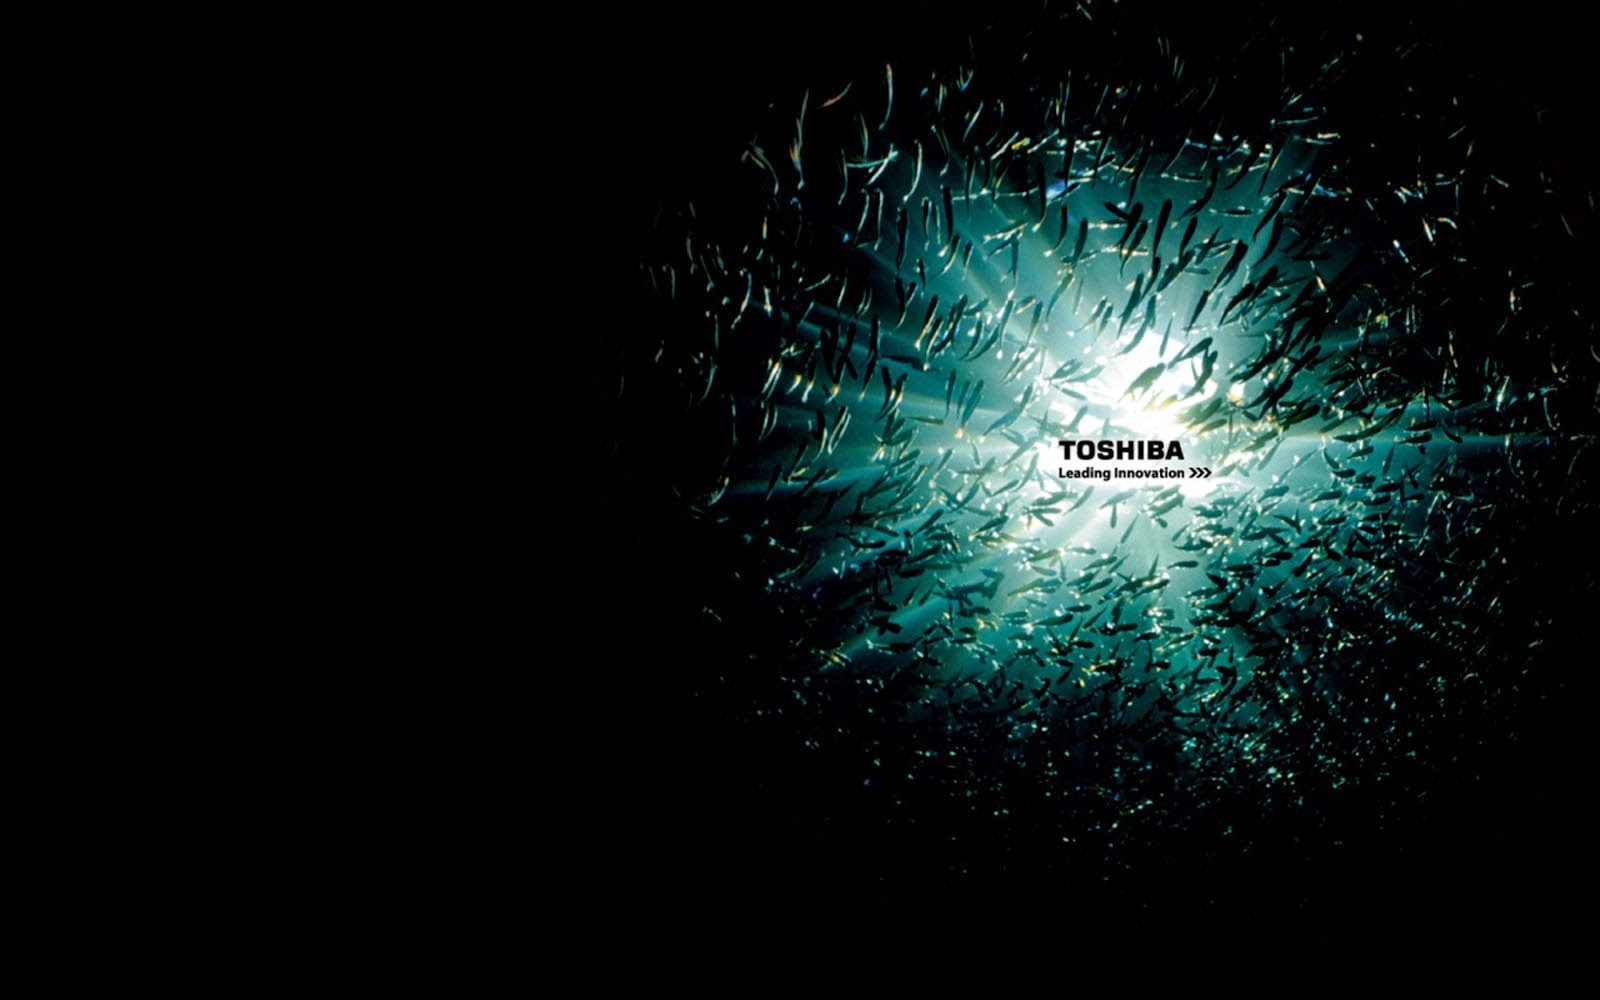 <b>Toshiba Background Wallpaper</b> #7033060